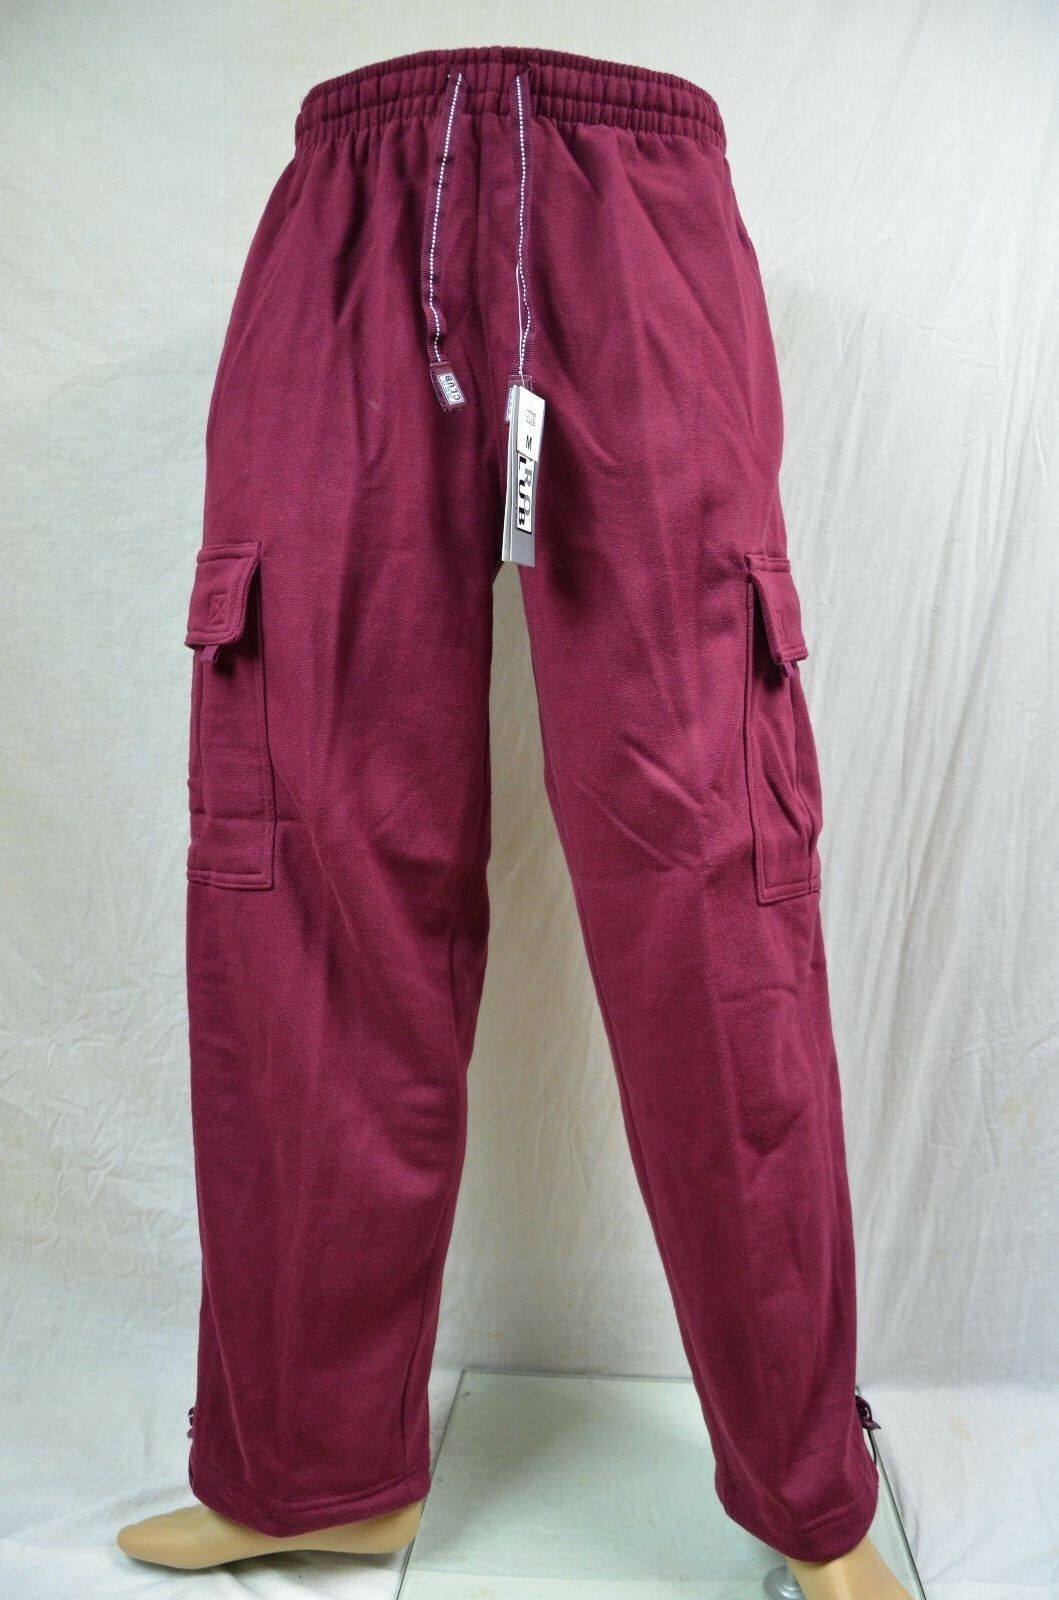 Pro Club Fleece Cargo Sweatpants Maroon Heavy Weight Jogging Mens S-7XL